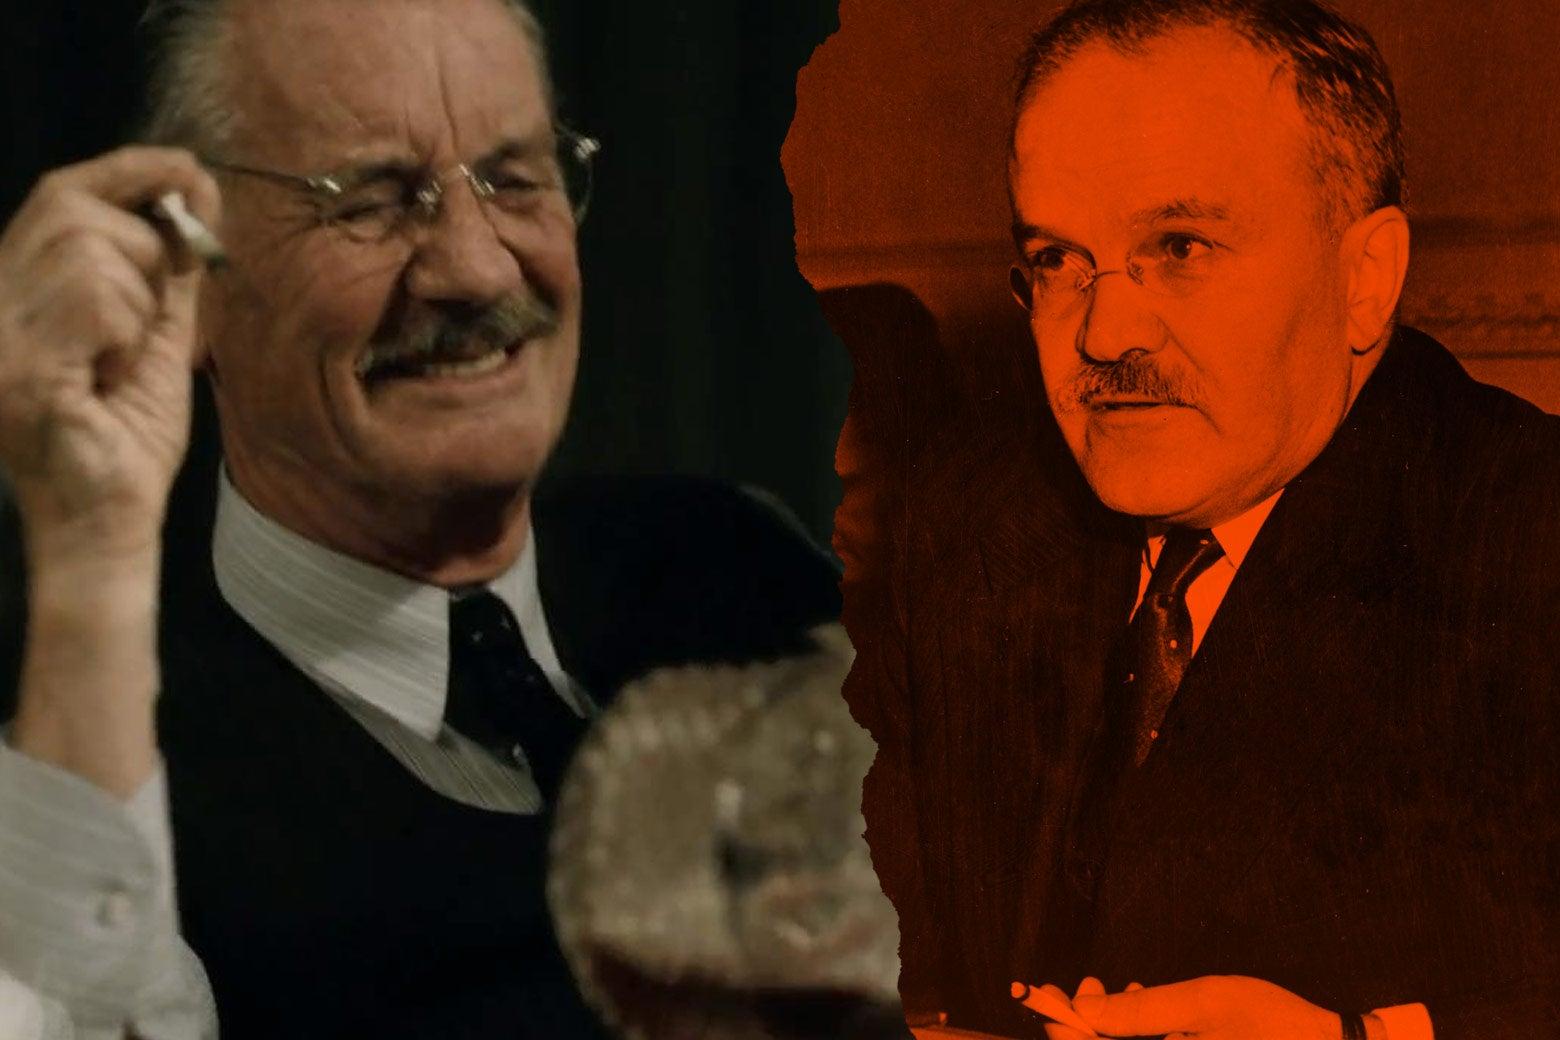 At left: Michael Palin as Vyacheslav Molotov in the film. At right: the real Vyacheslav Molotov.